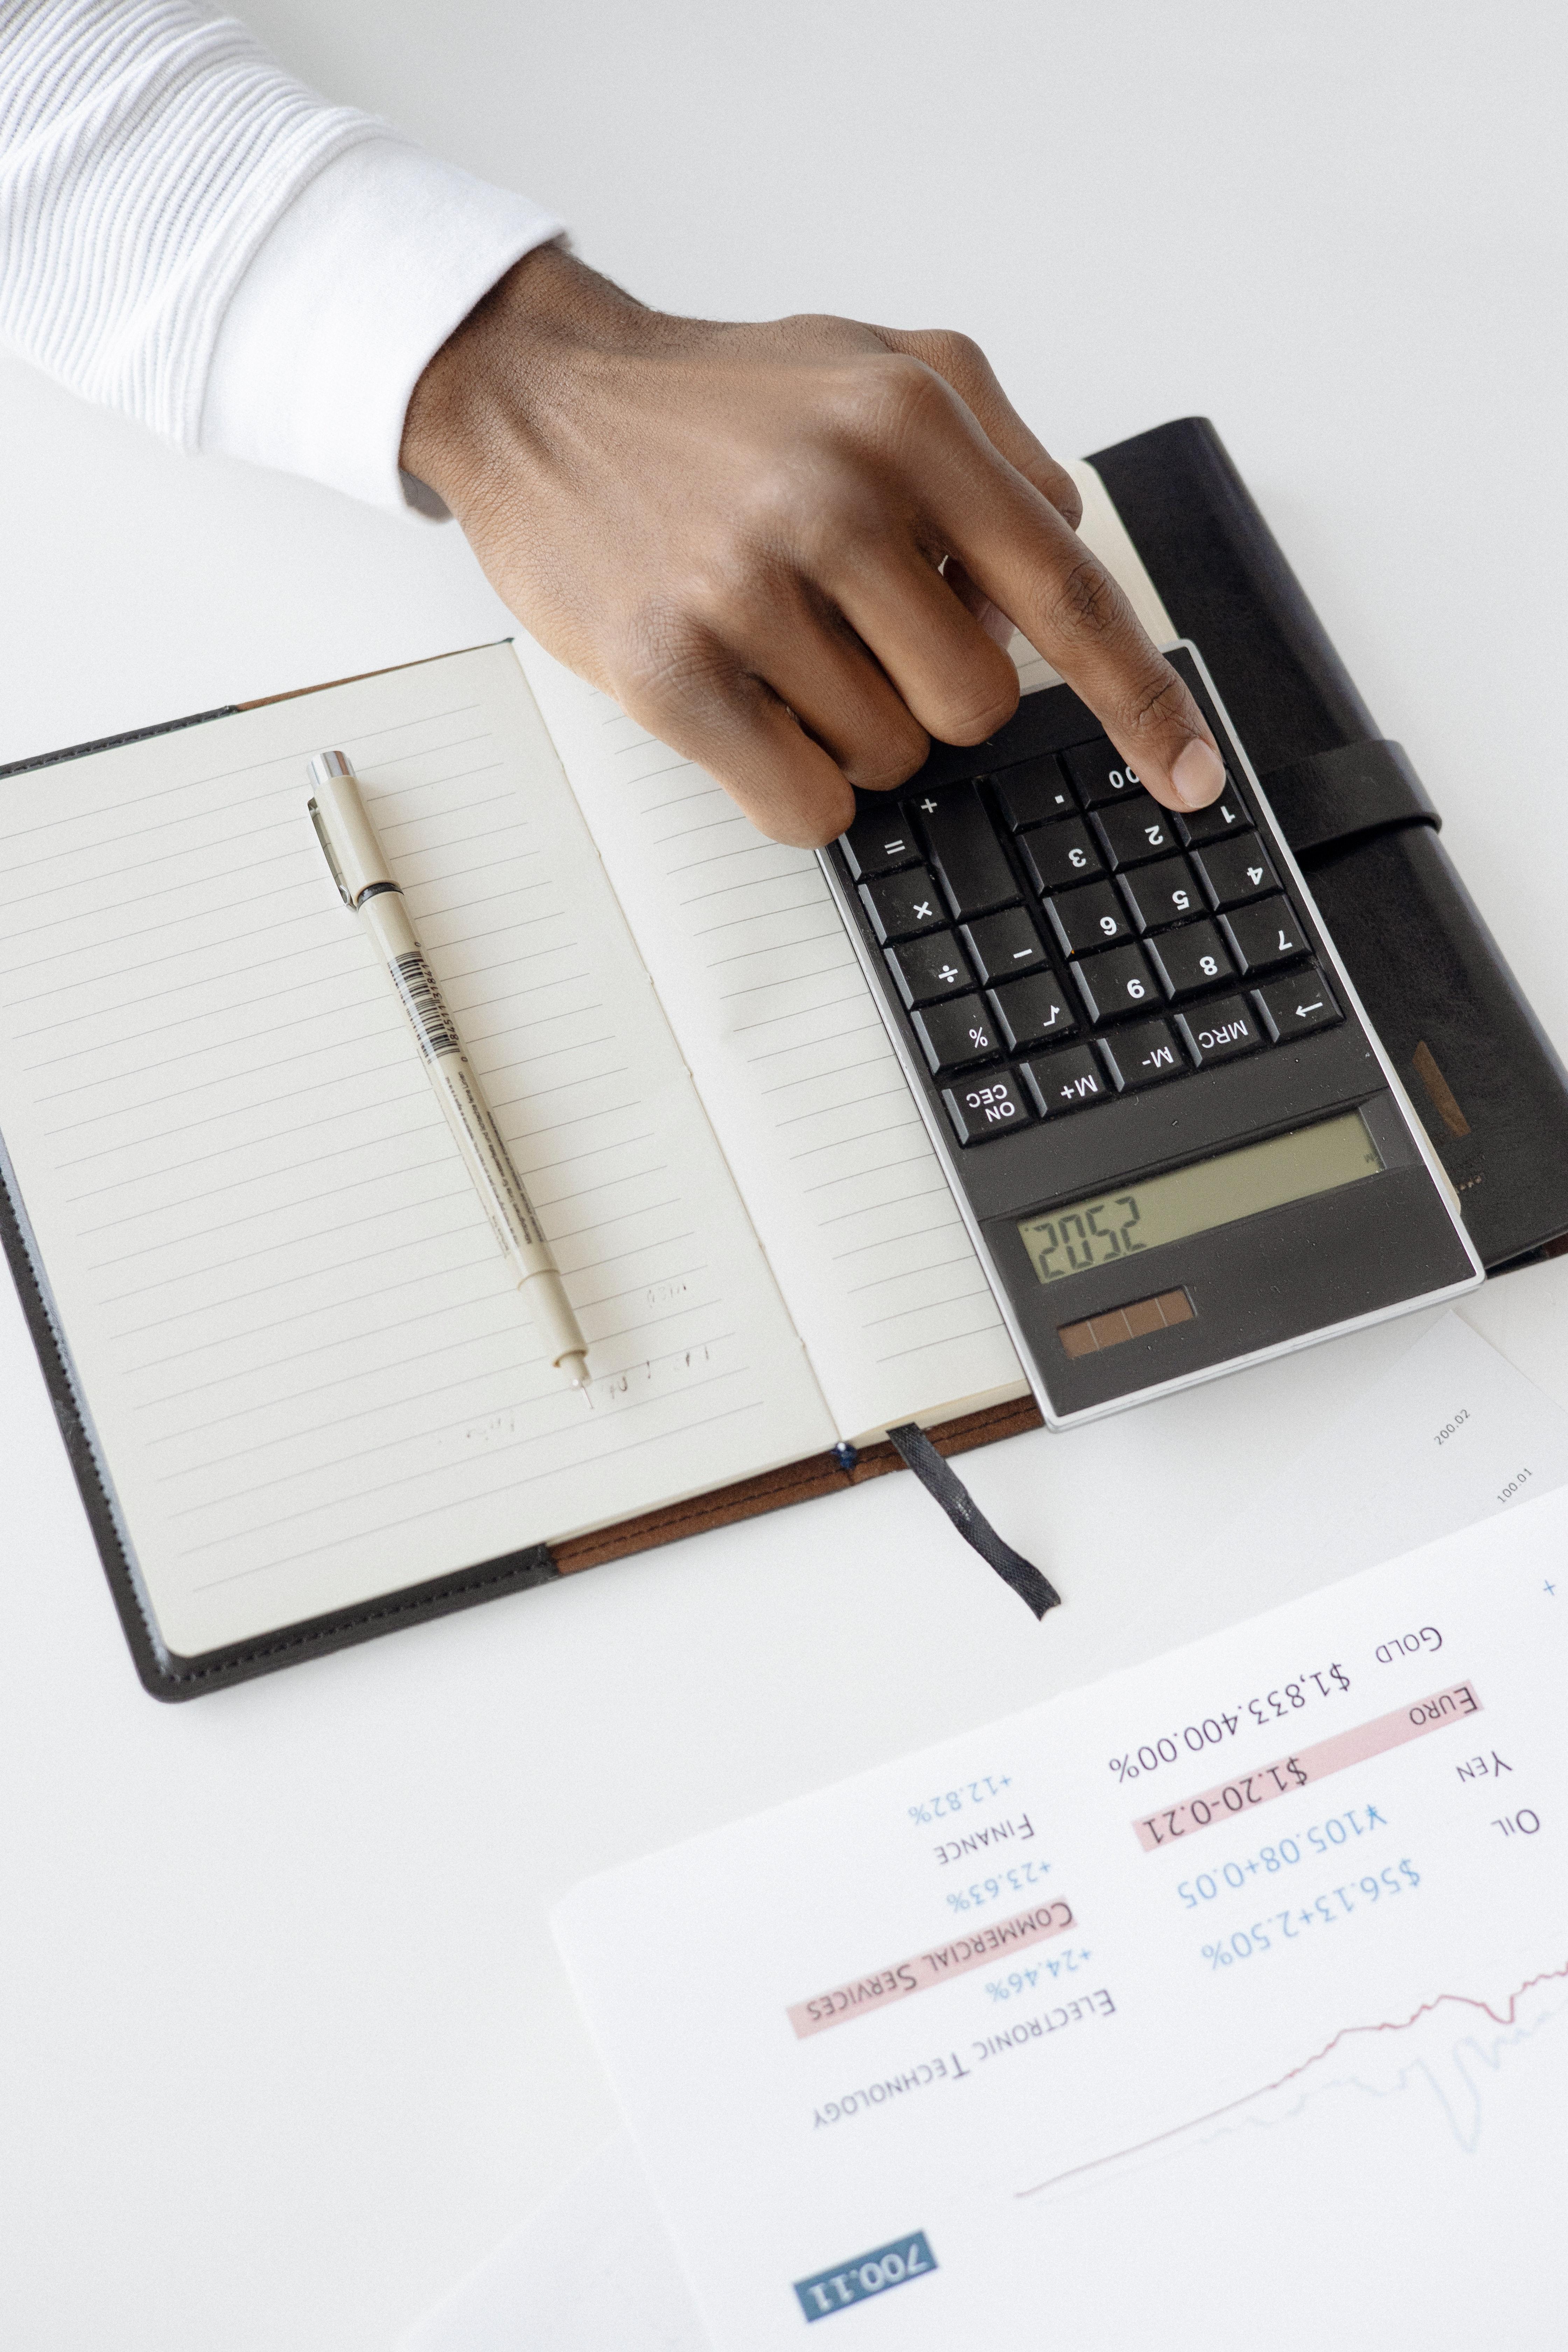 Profitable Commercial Insurance Adjusting Firm for Sale